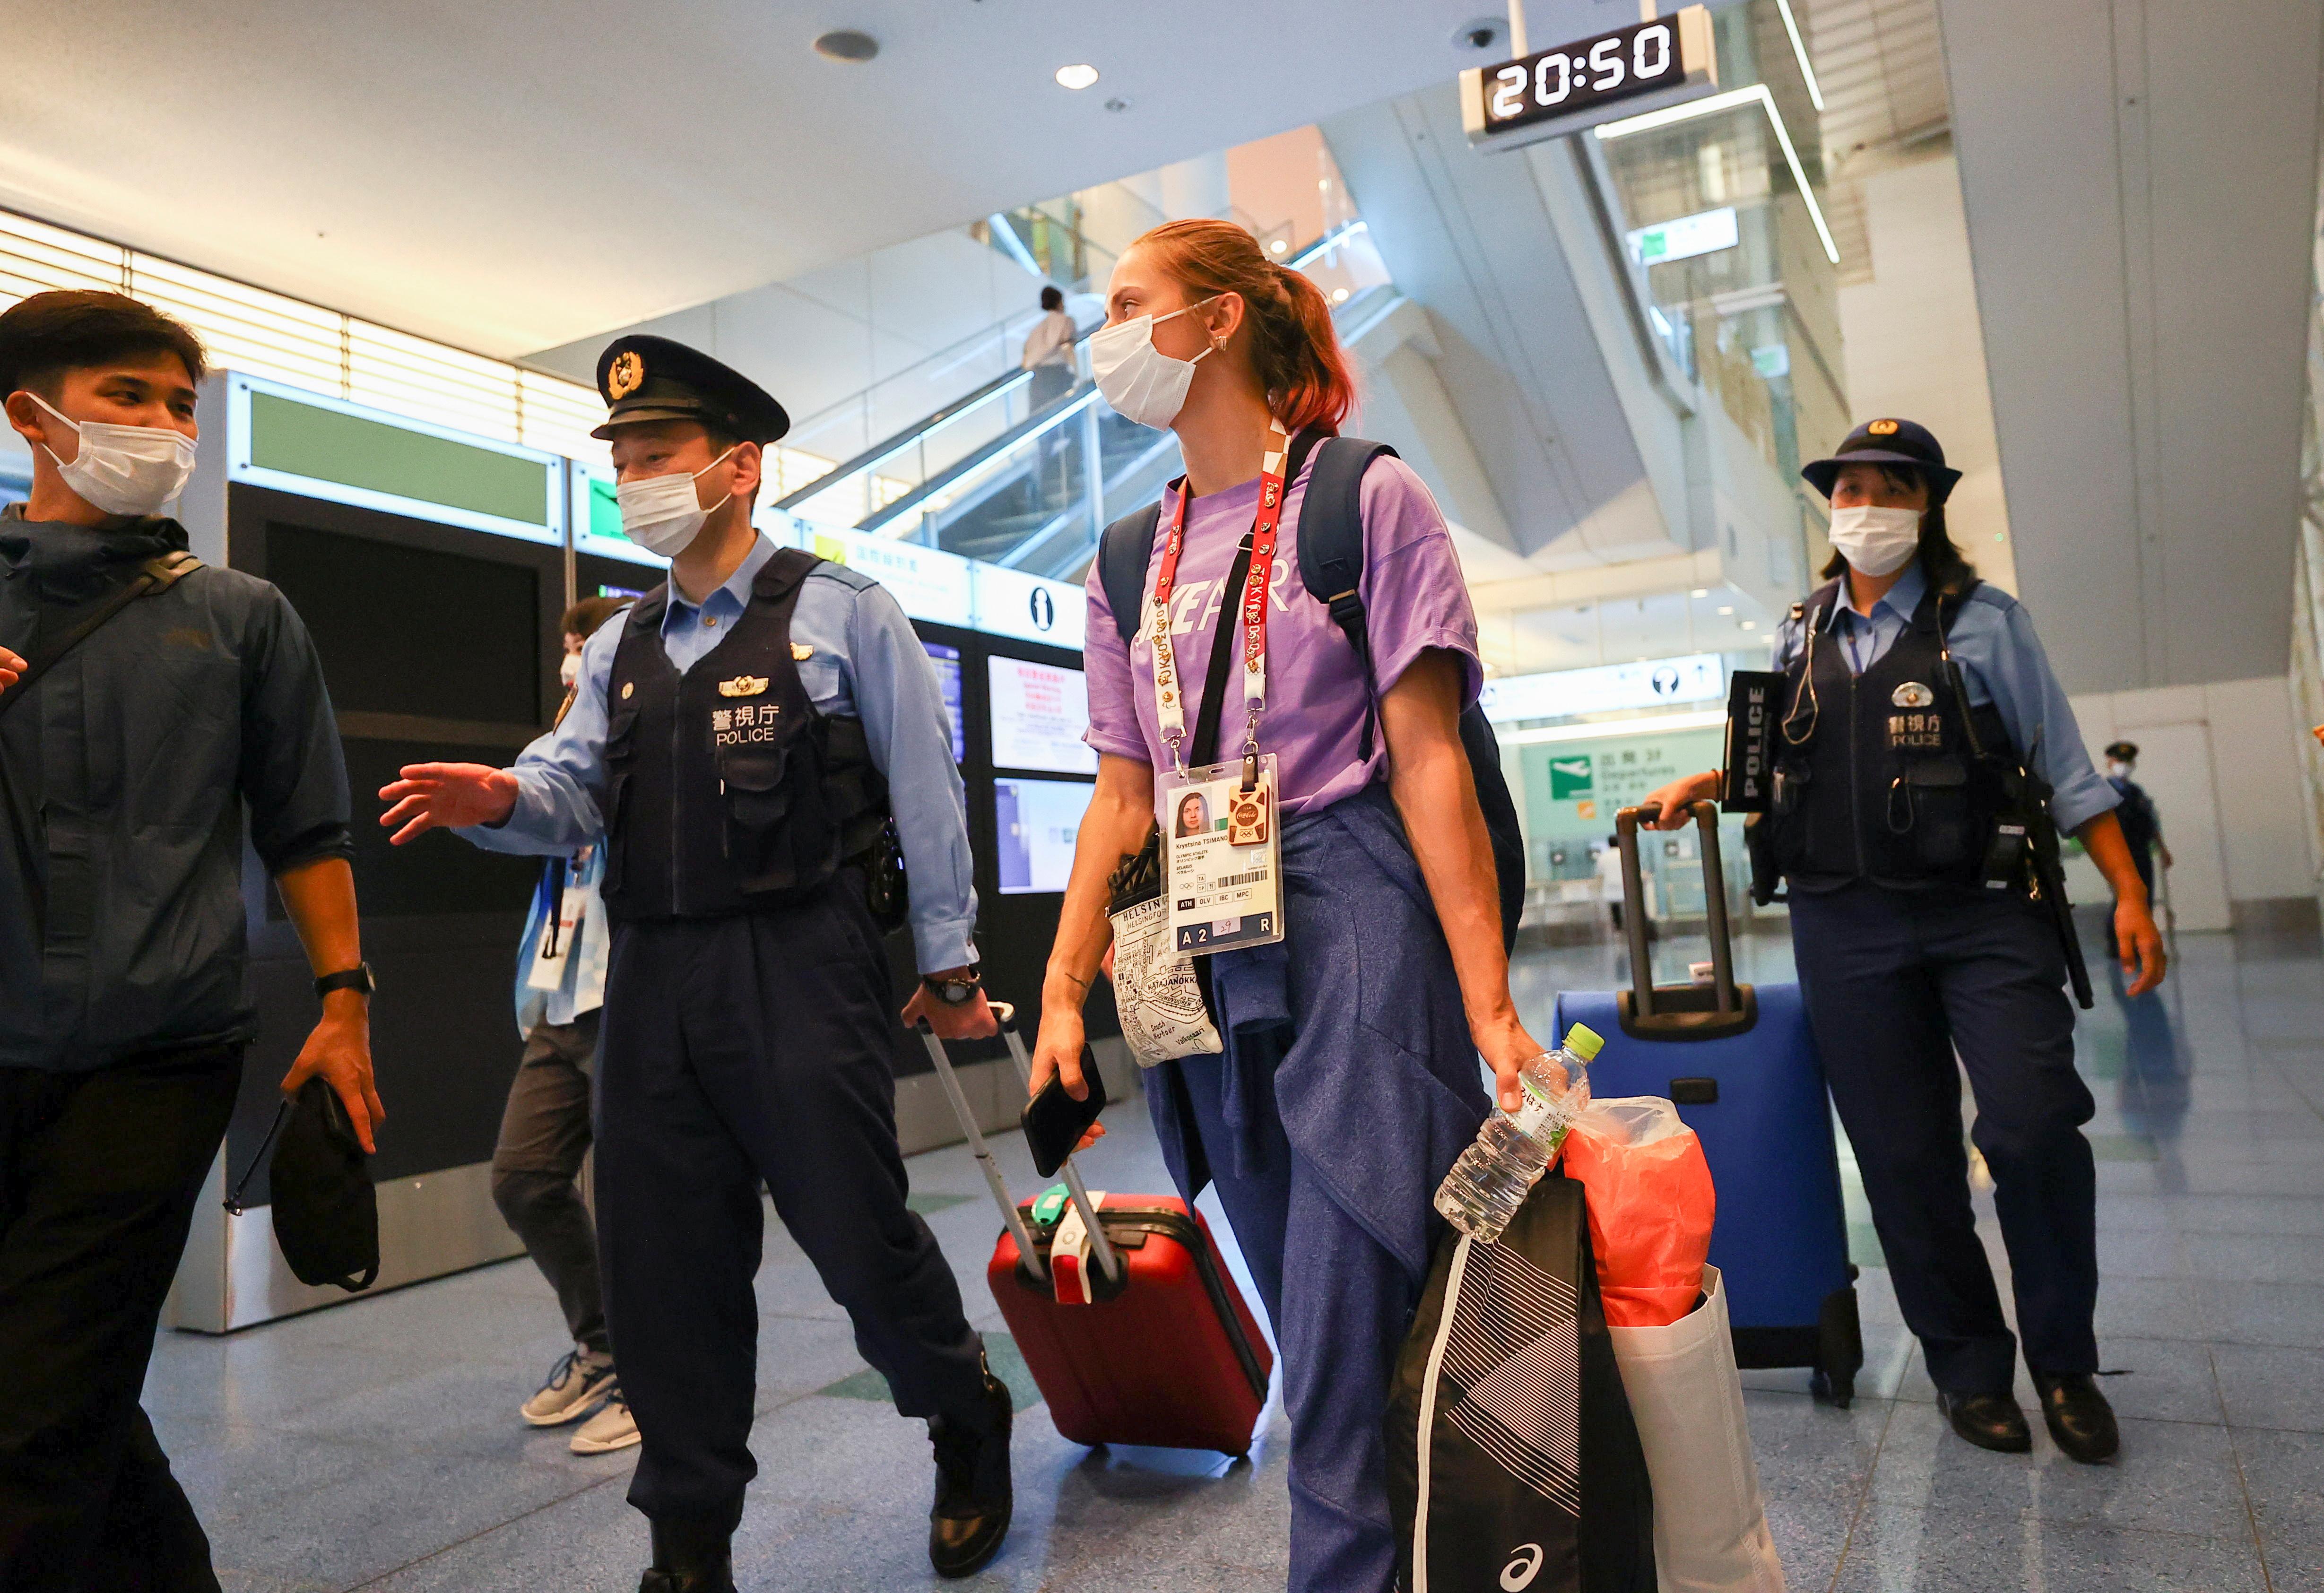 Belarusian athlete Krystsina Tsimanouskaya is escorted by police officers at Haneda international airport in Tokyo, Japan August 1, 2021.  REUTERS/Issei Kato